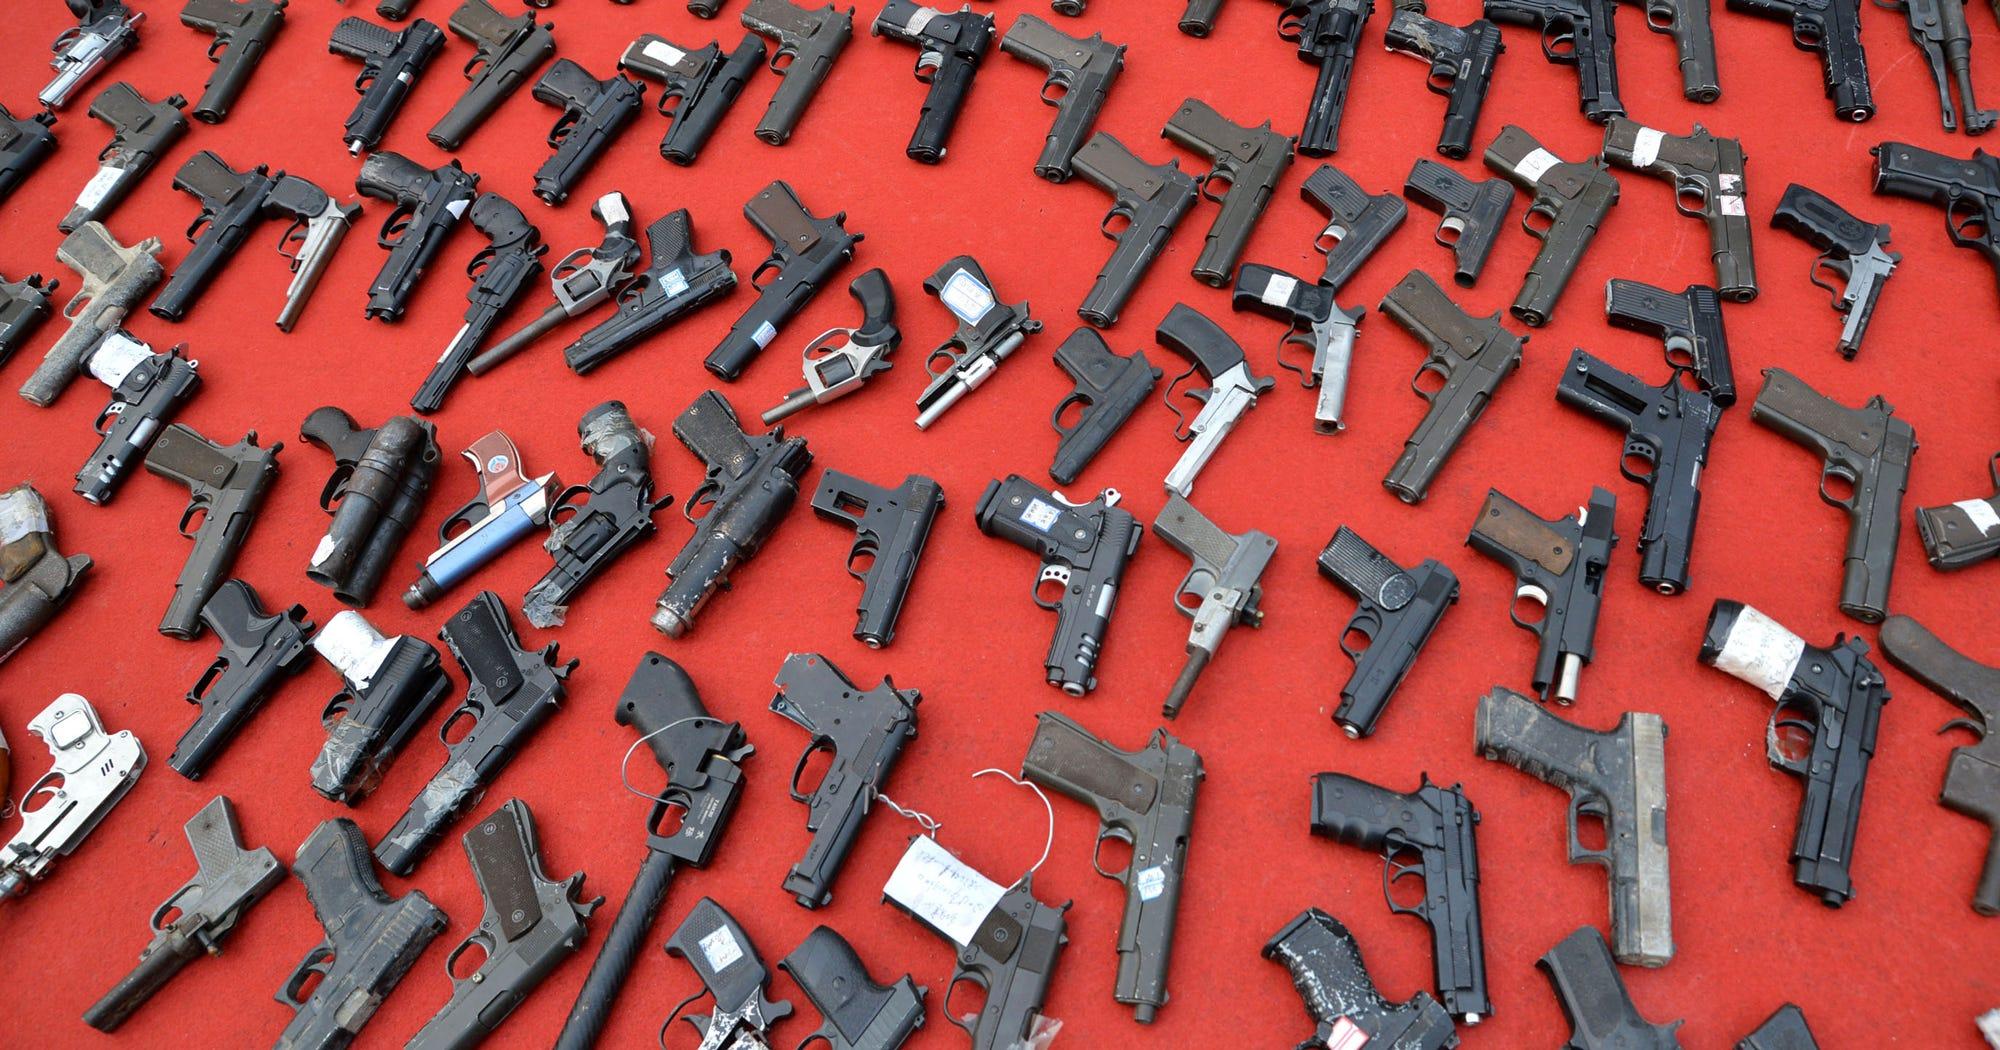 black friday gun sales record. Black Bedroom Furniture Sets. Home Design Ideas